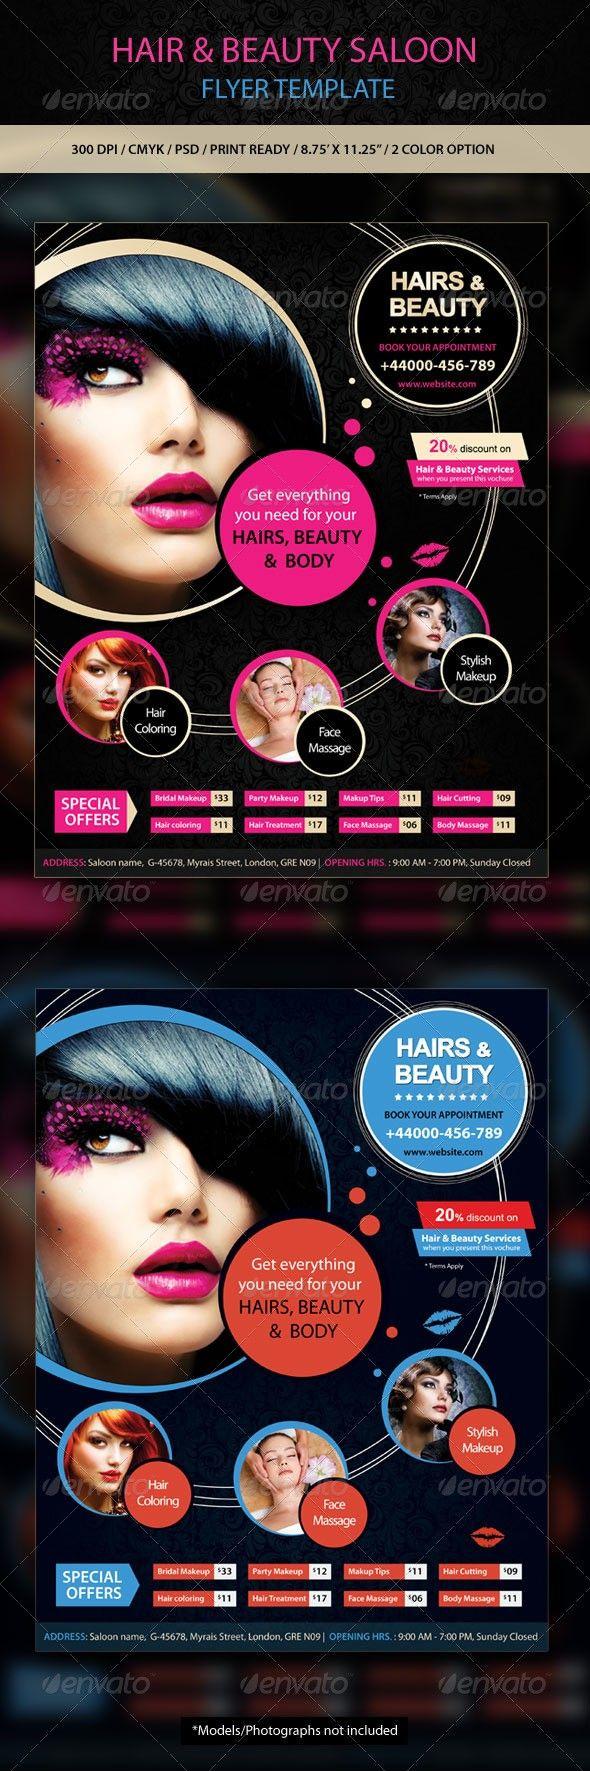 Hair Beauty Saloon Flyer Flyer Design Pinterest Fonts And